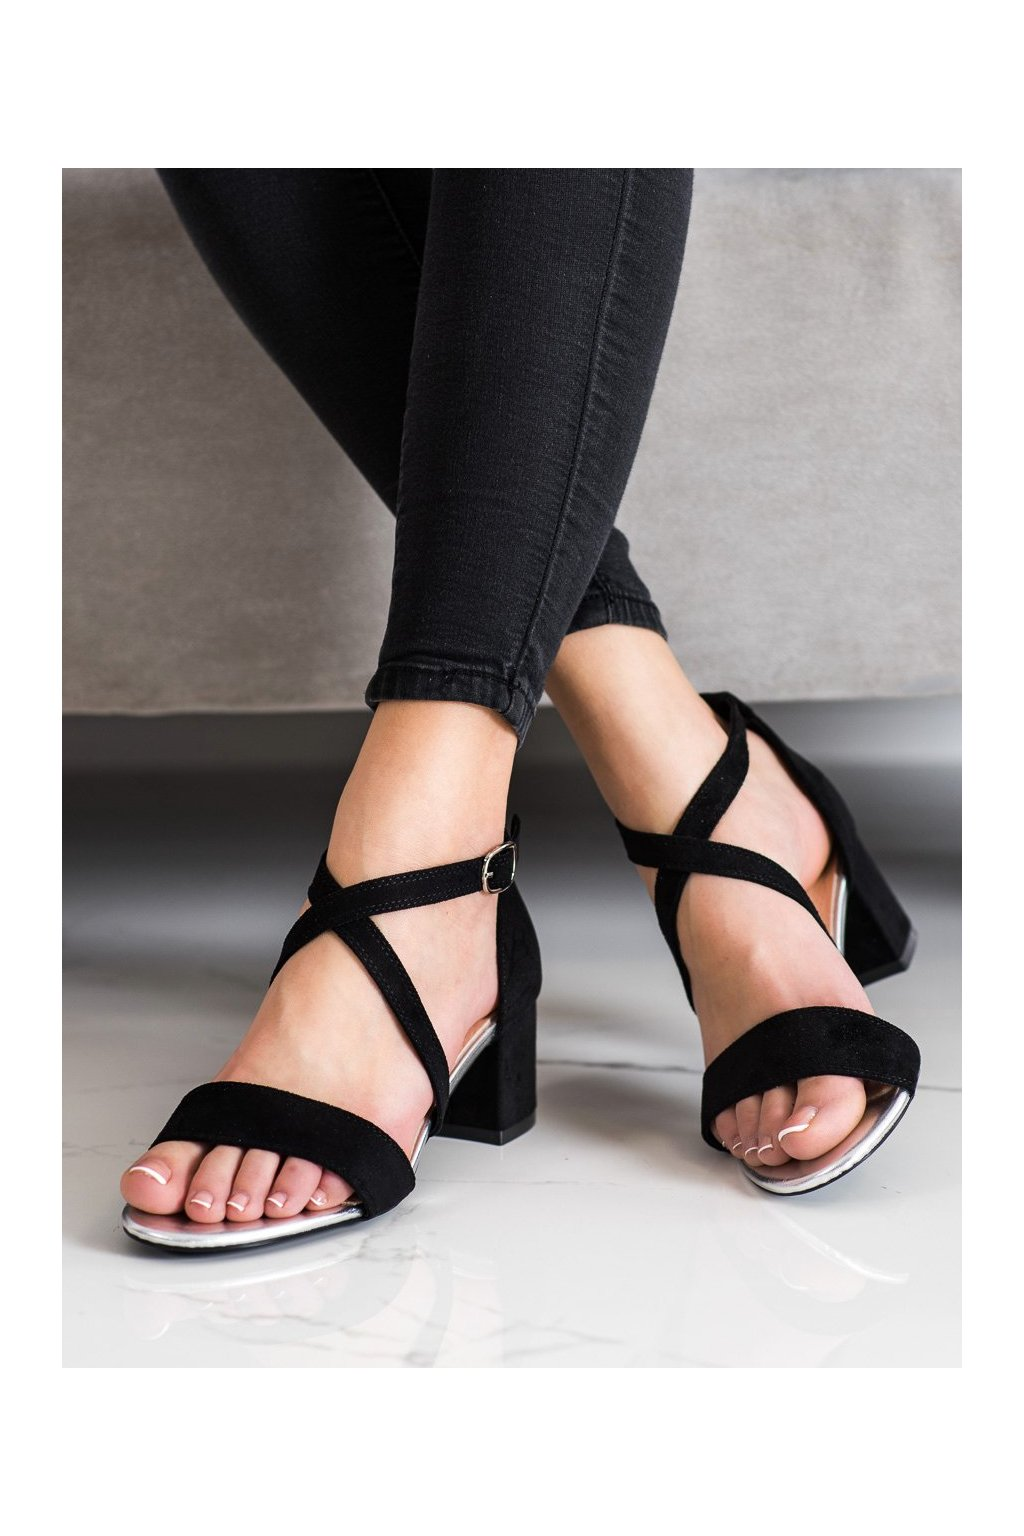 Čierne sandále na podpätku Sergio leone kod SK837B/S